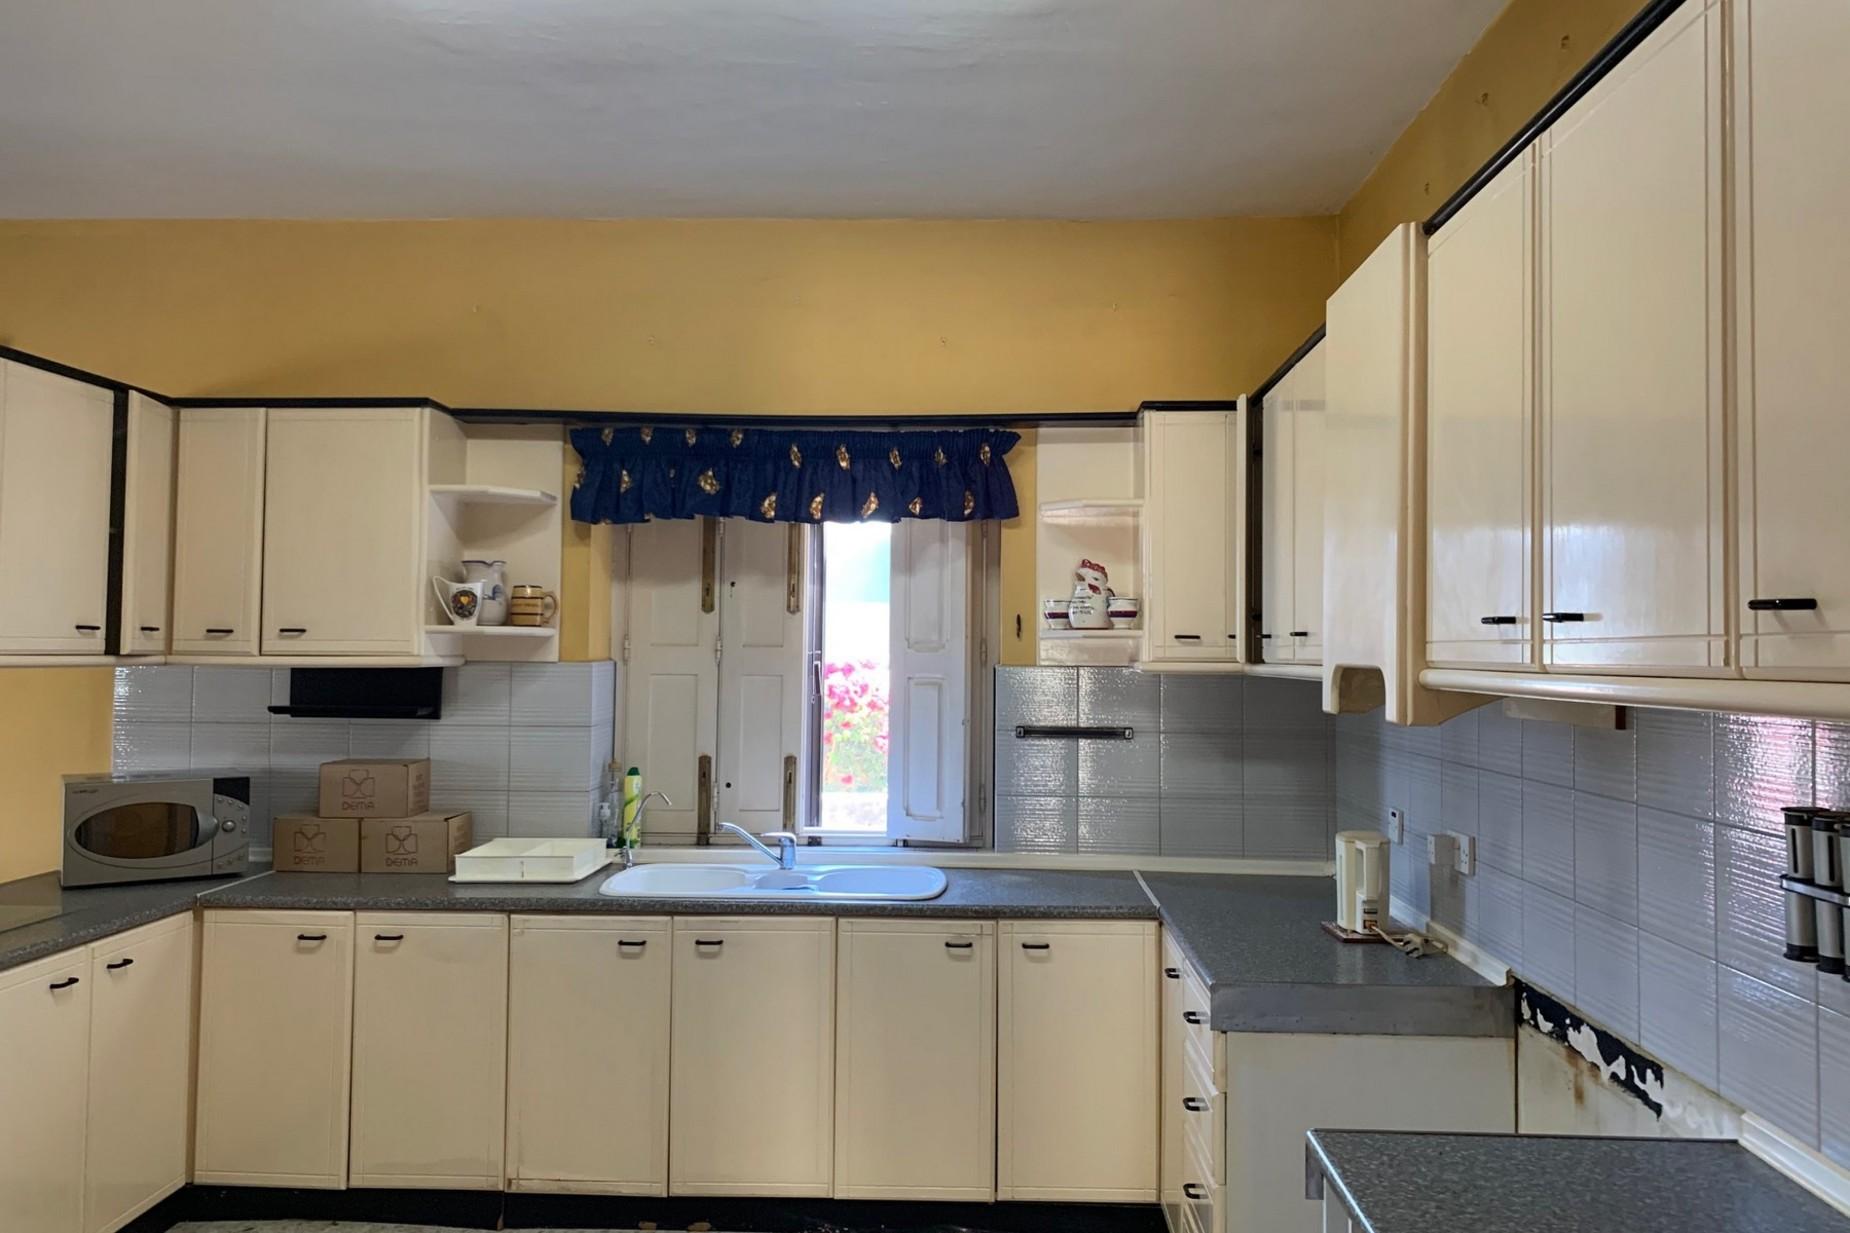 6 bed Villa For Rent in Naxxar, Naxxar - thumb 11